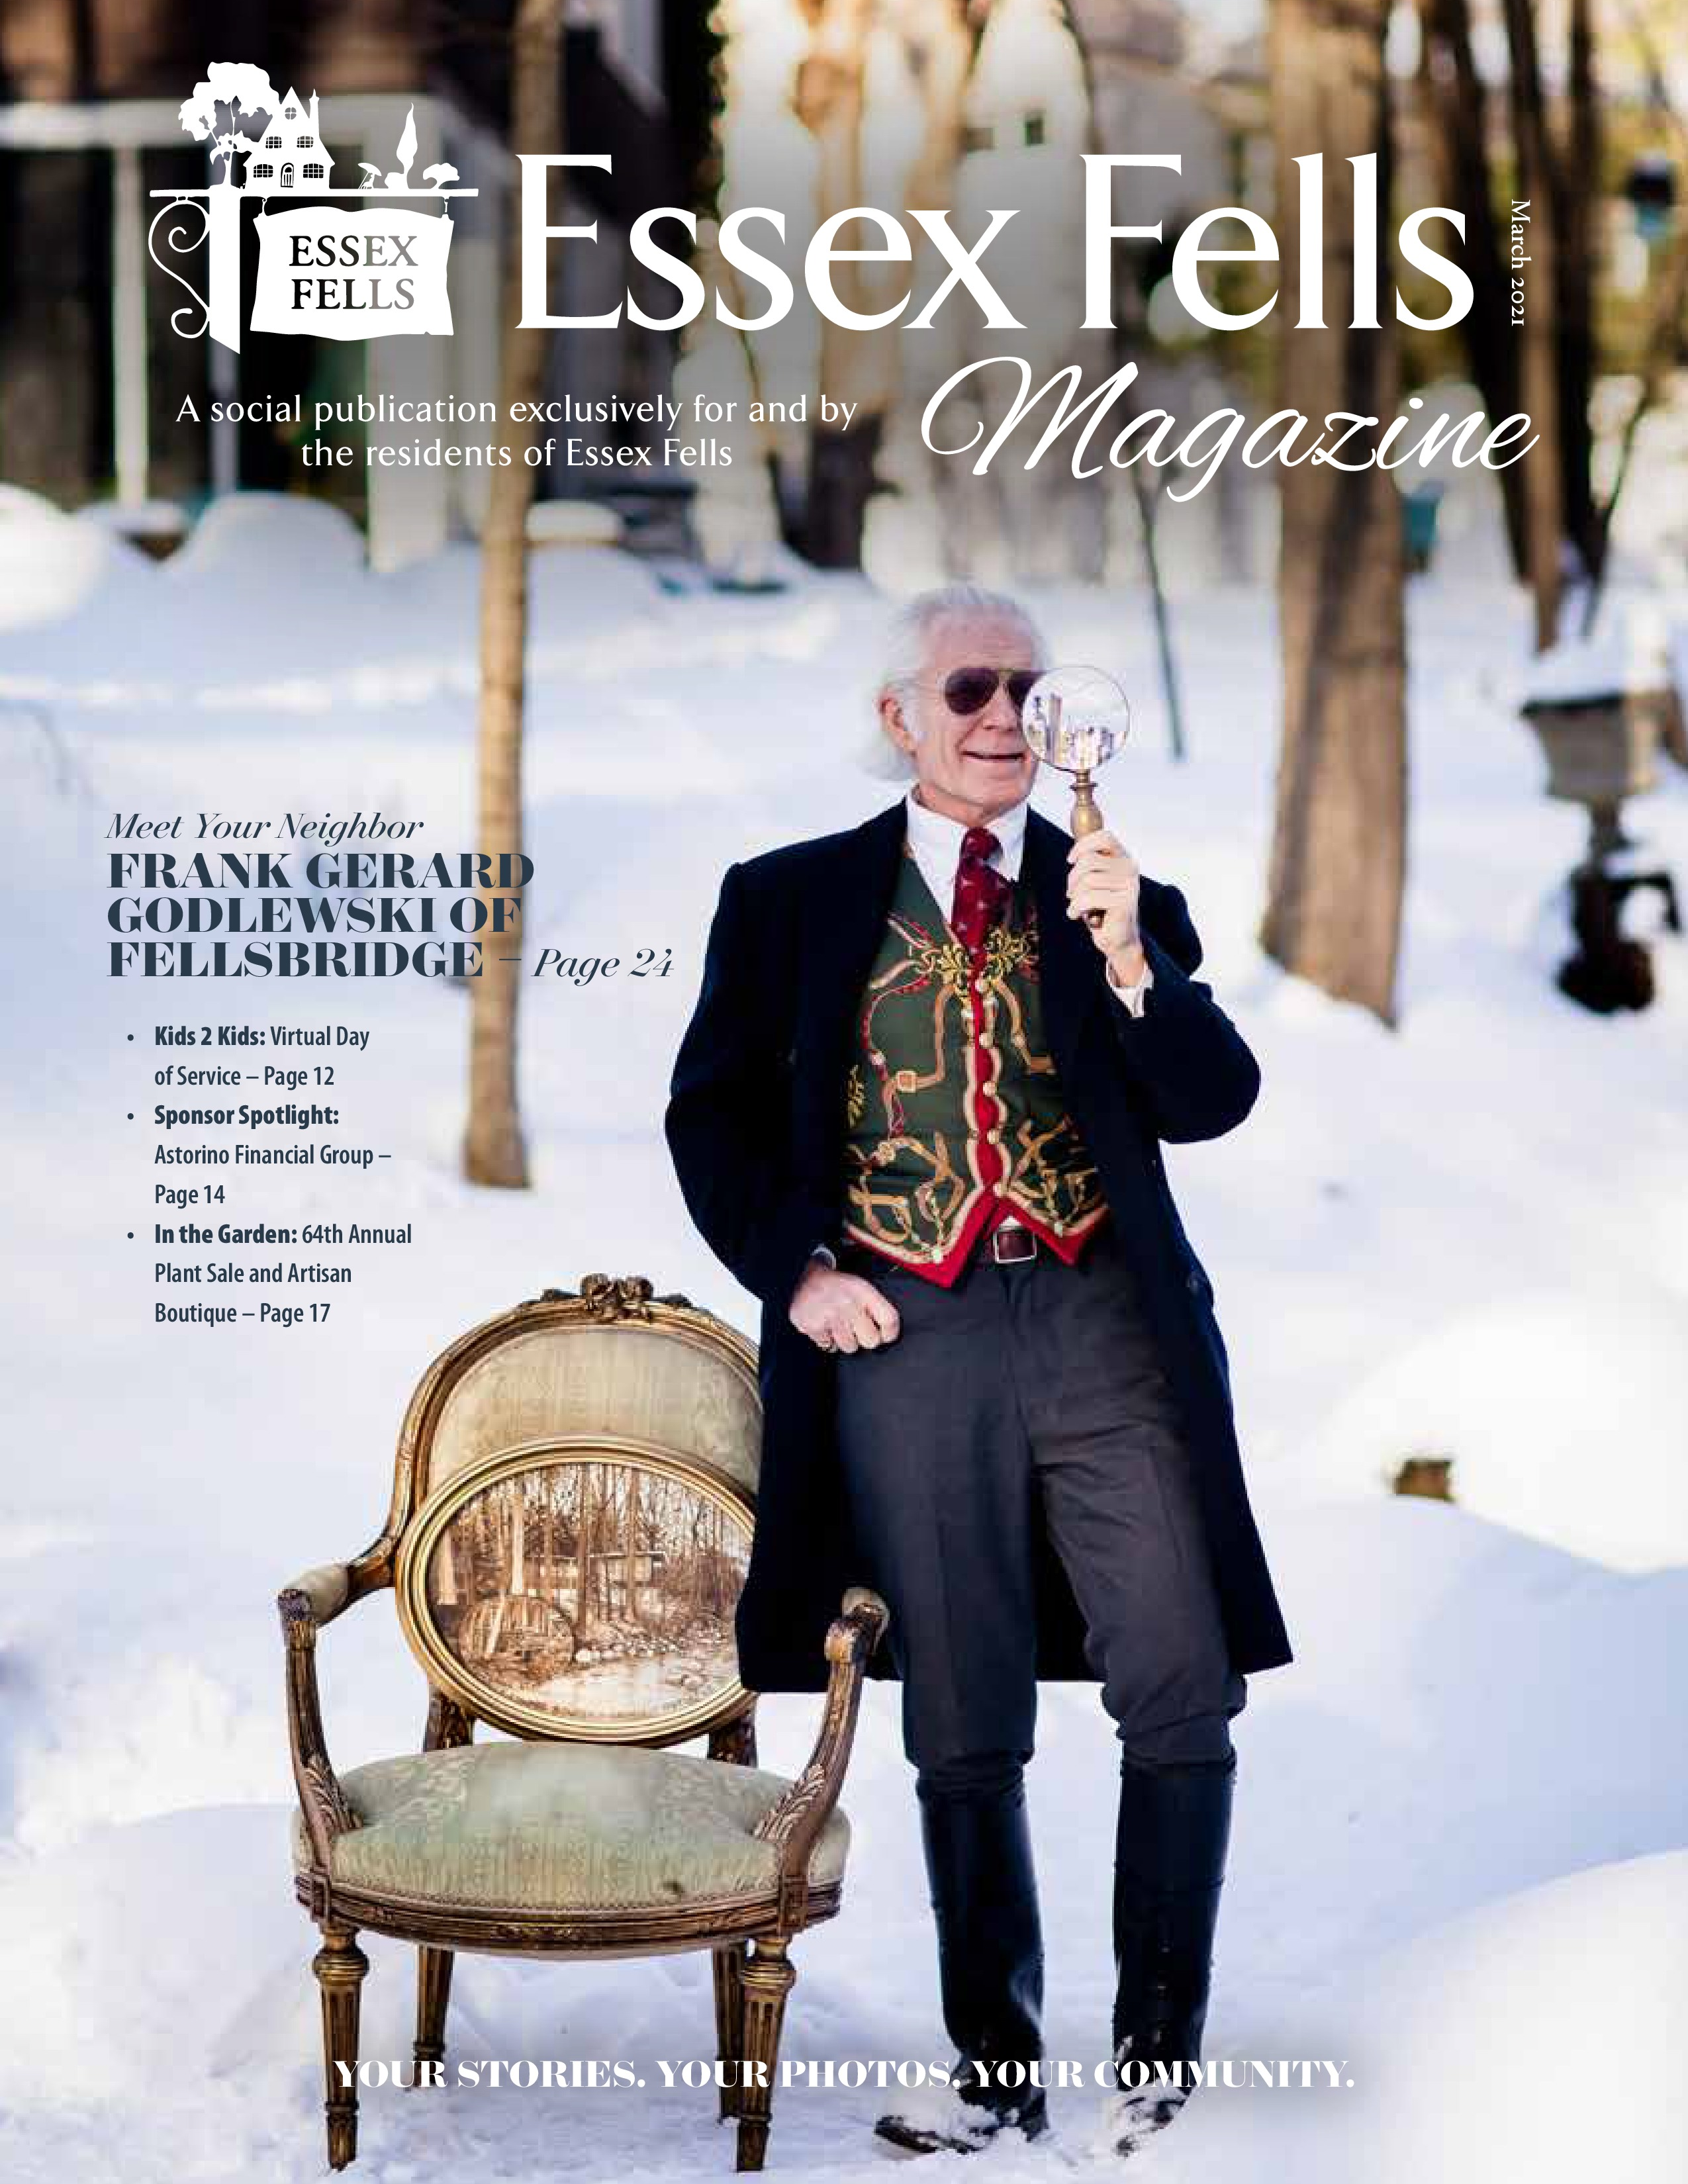 Essex Fells Magazine 2021-03-01